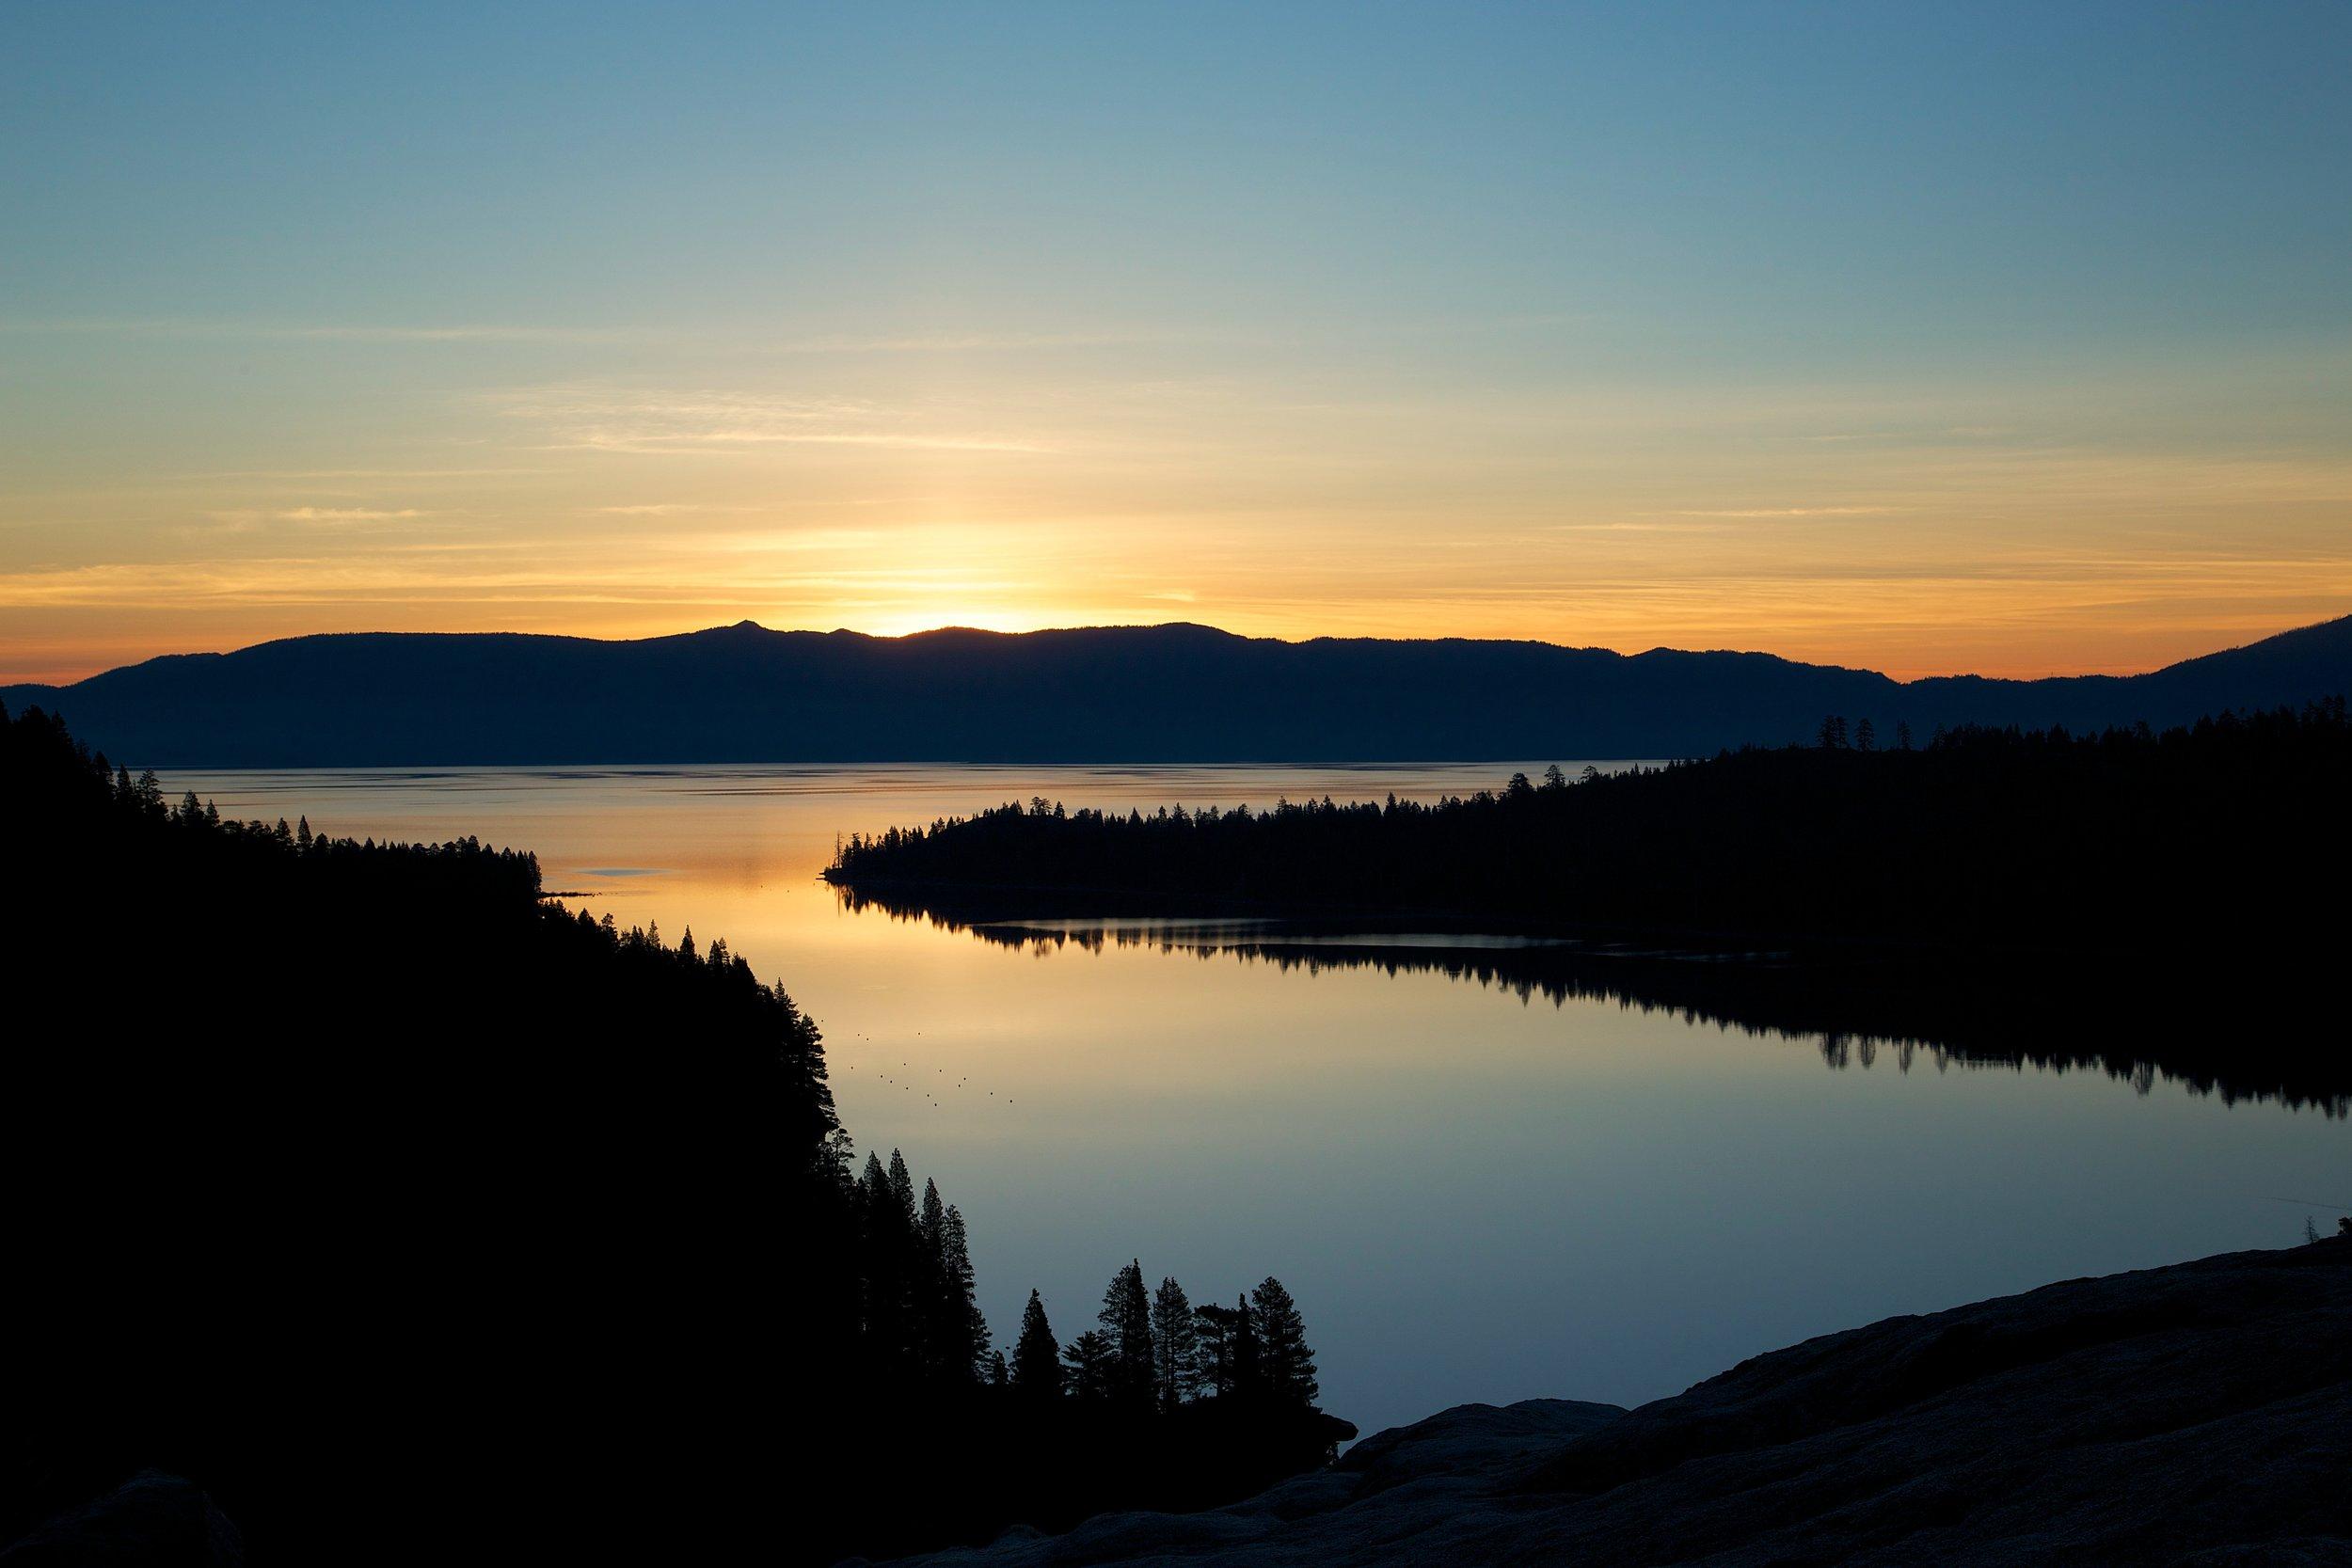 Emerald Bay - Emerald Bay State Park, Lake Tahoe